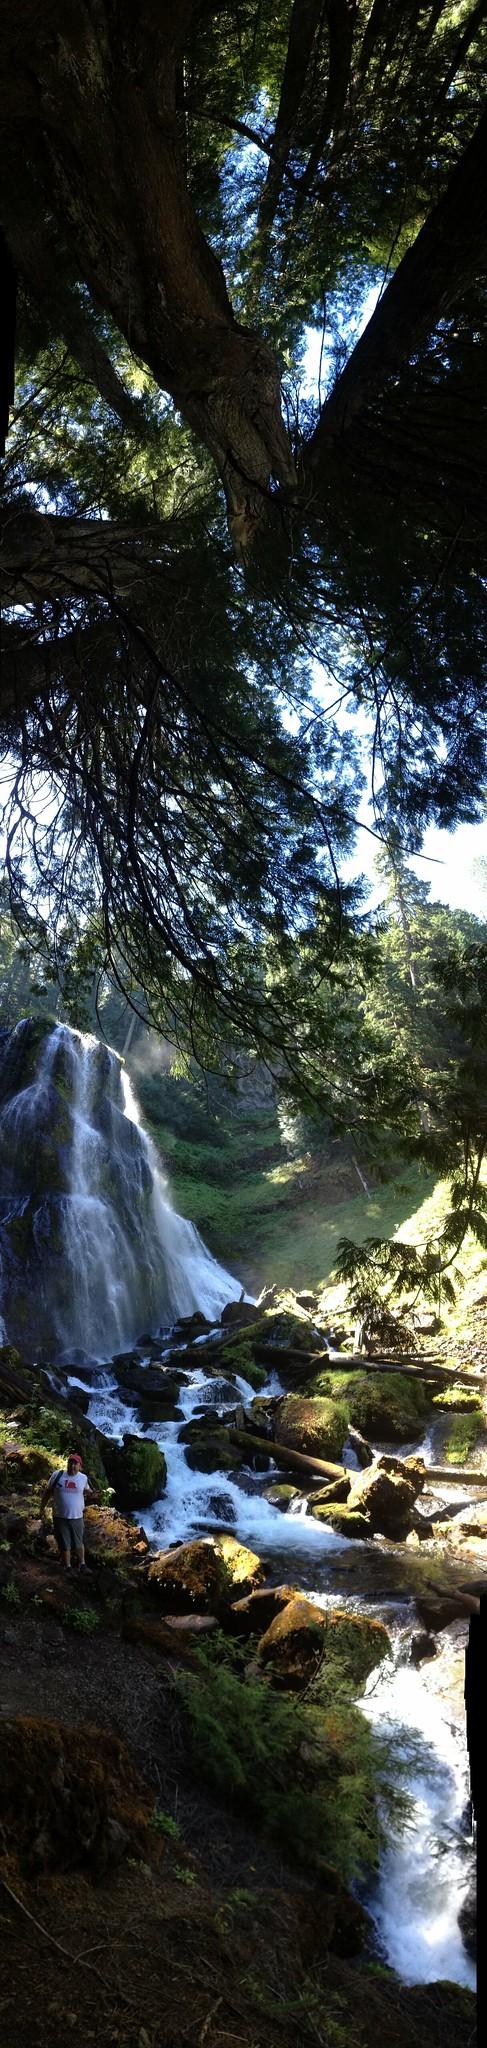 Falls Creek Falls Vertorama